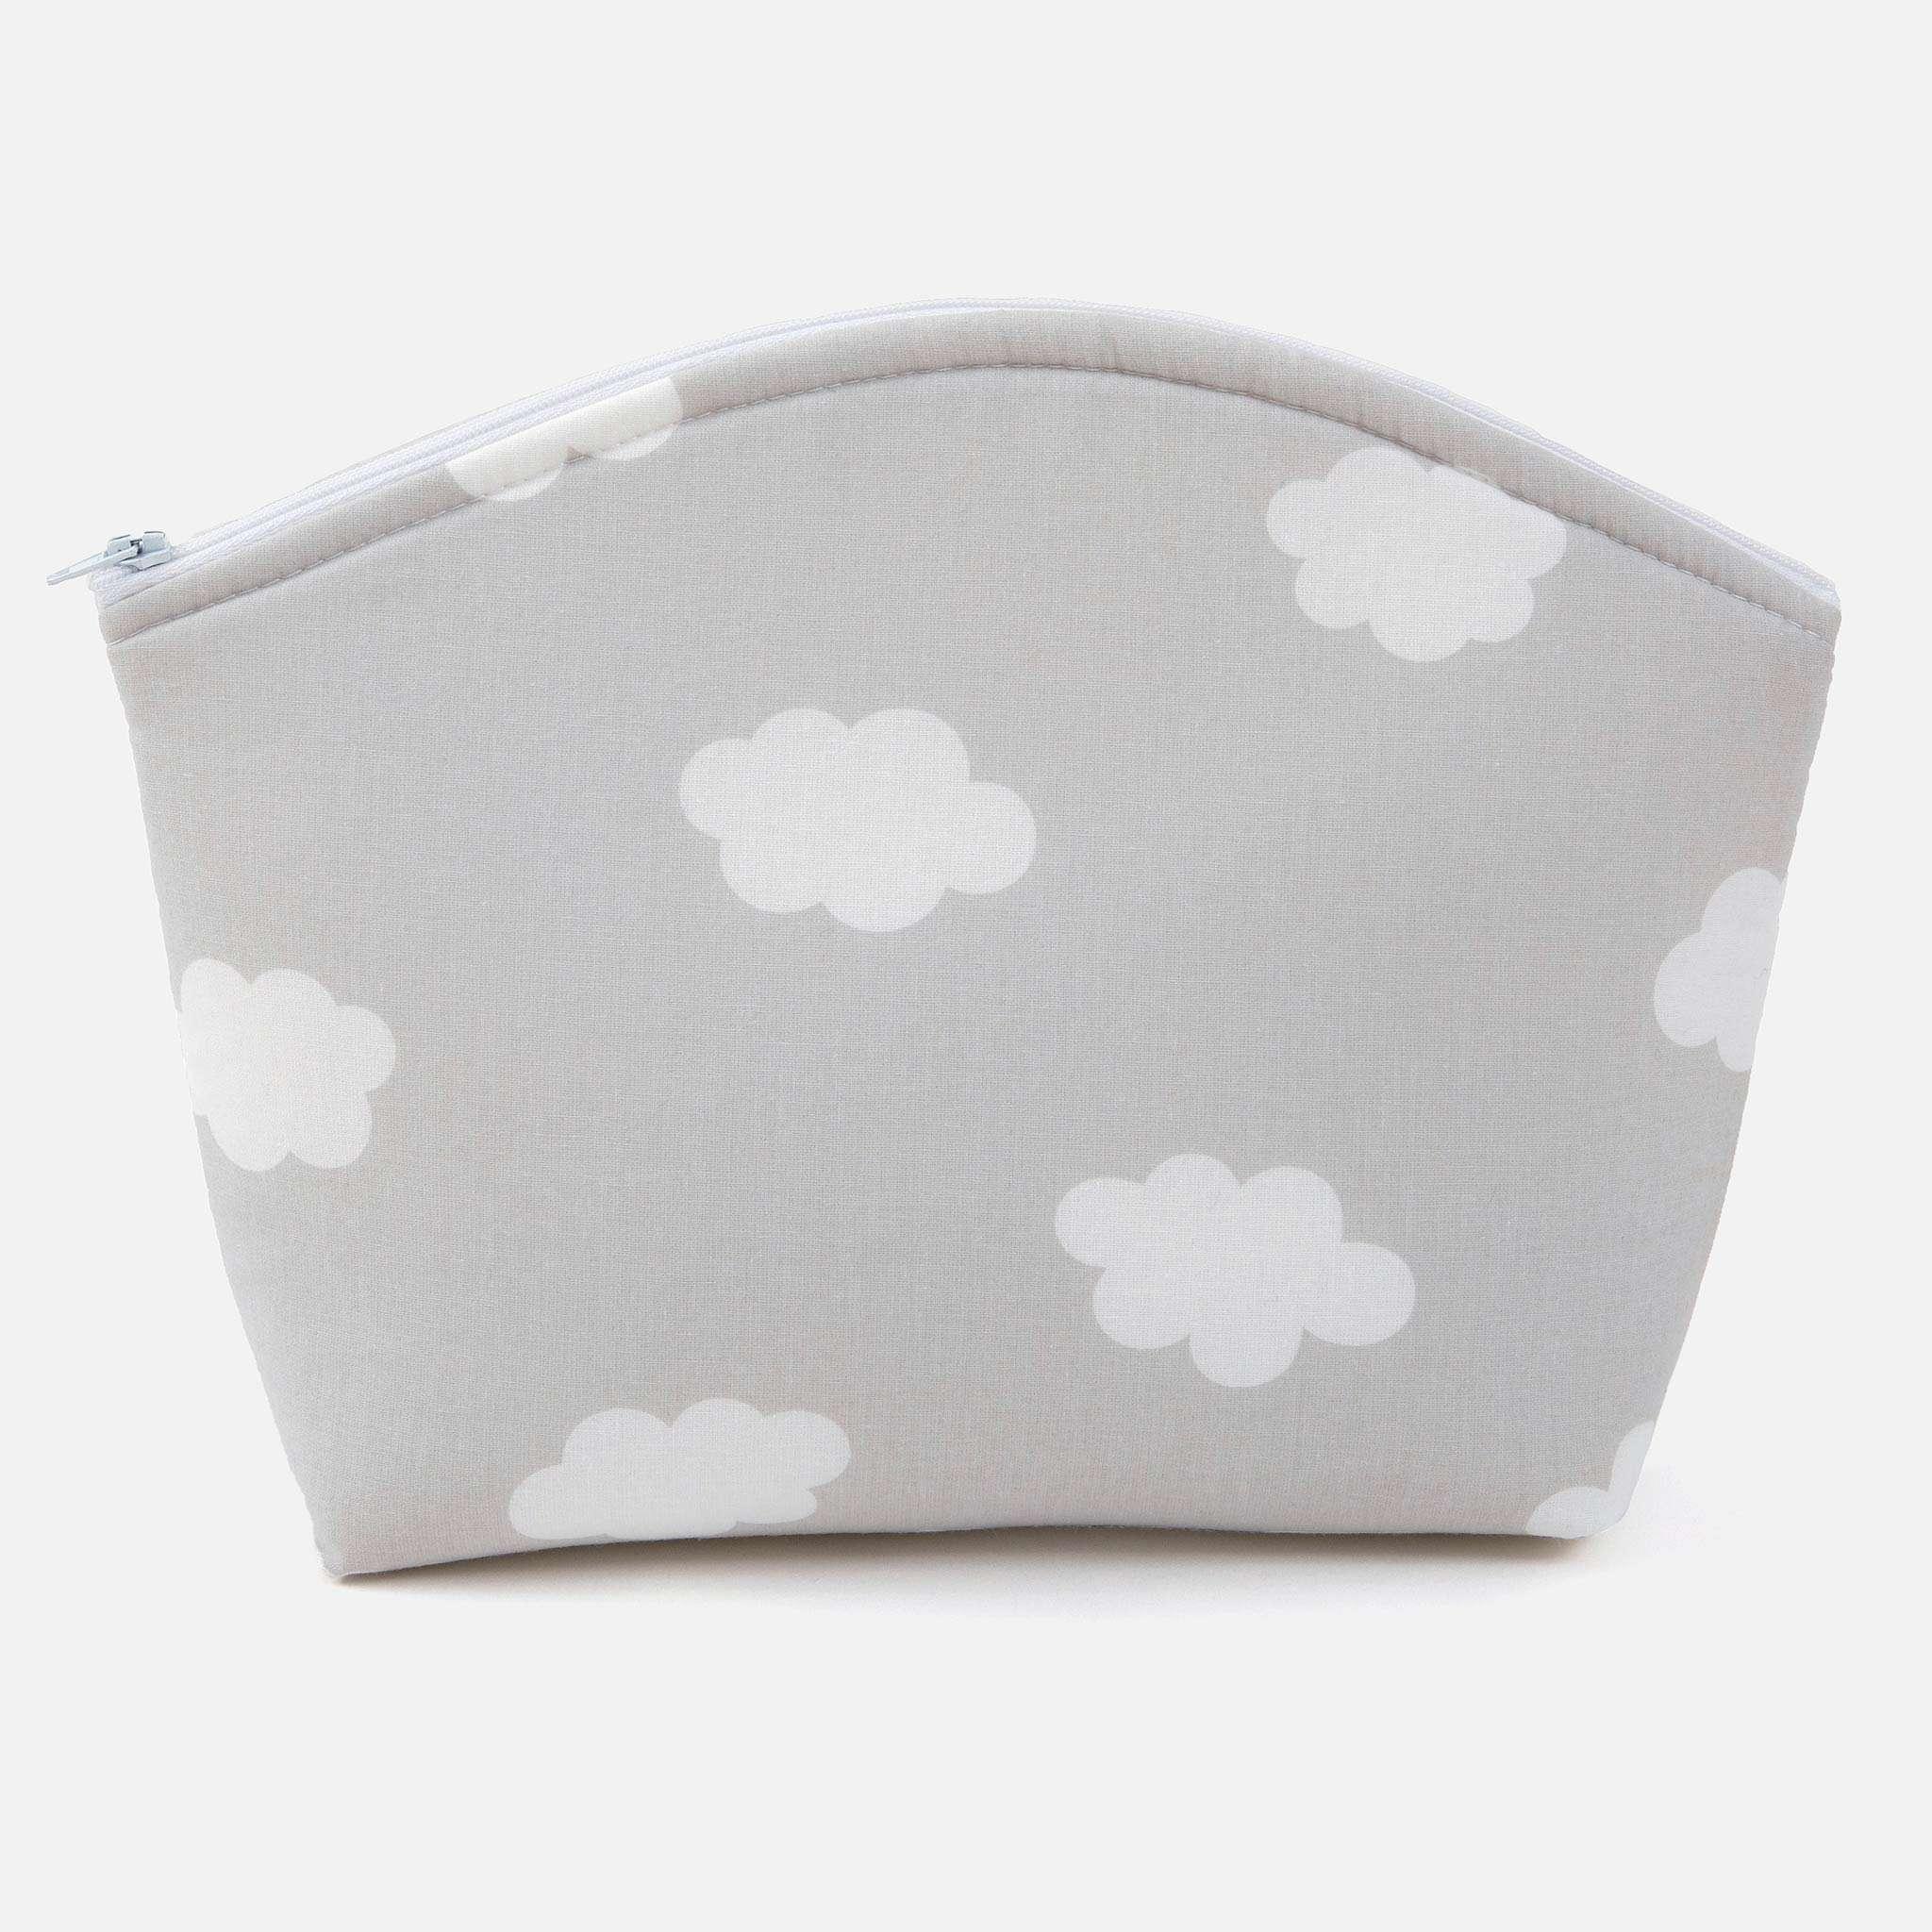 Clouds liten väska